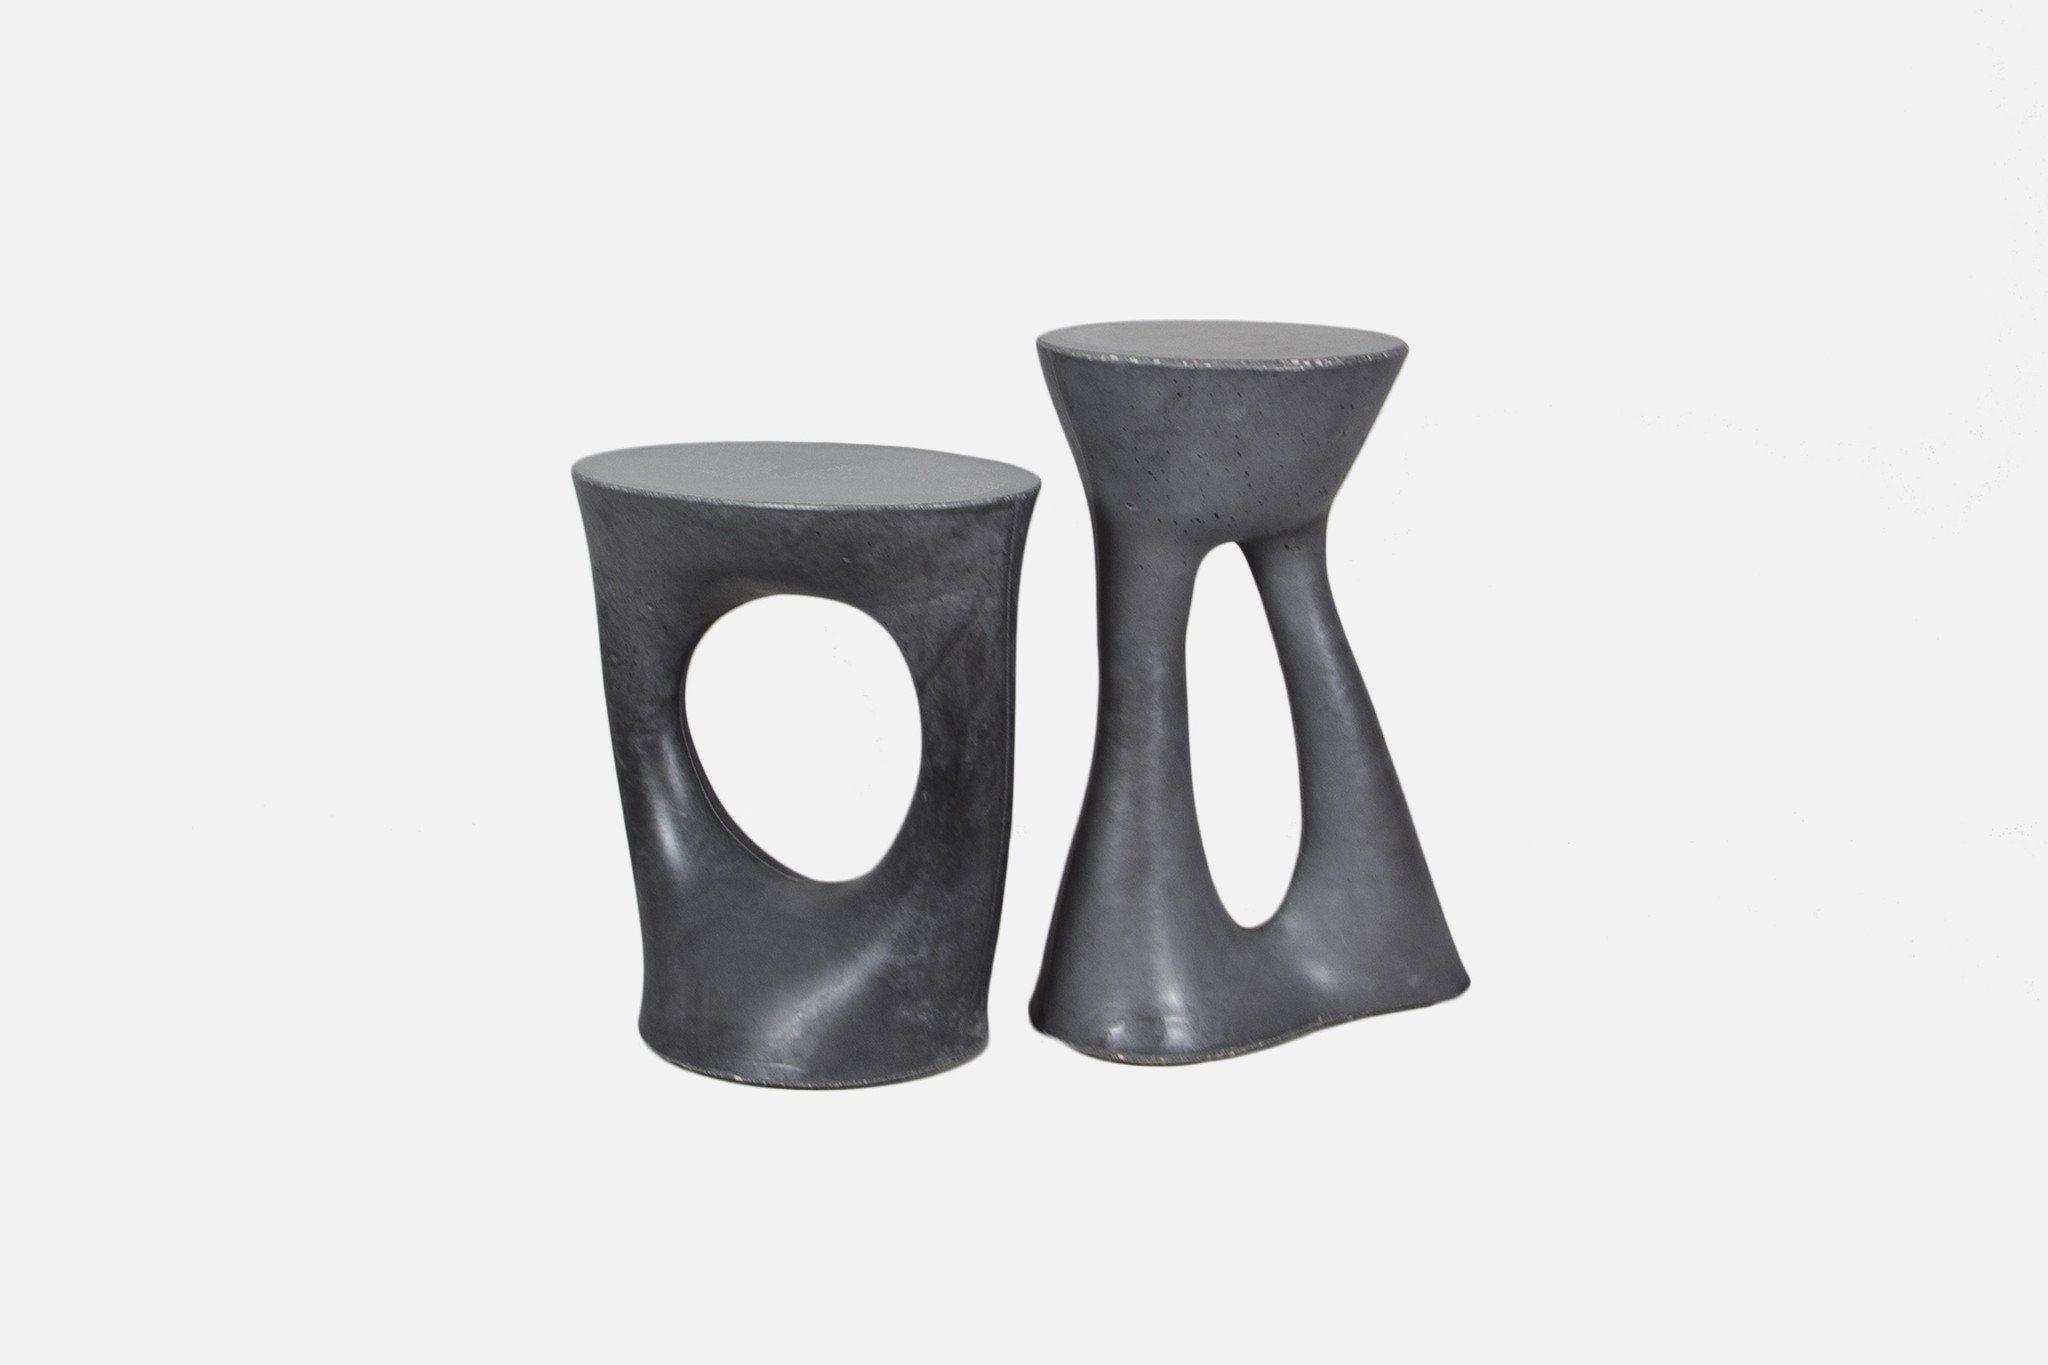 Modern wood side table  Kreten Side Table  Short  Charcoal  Furniture  Side Tables